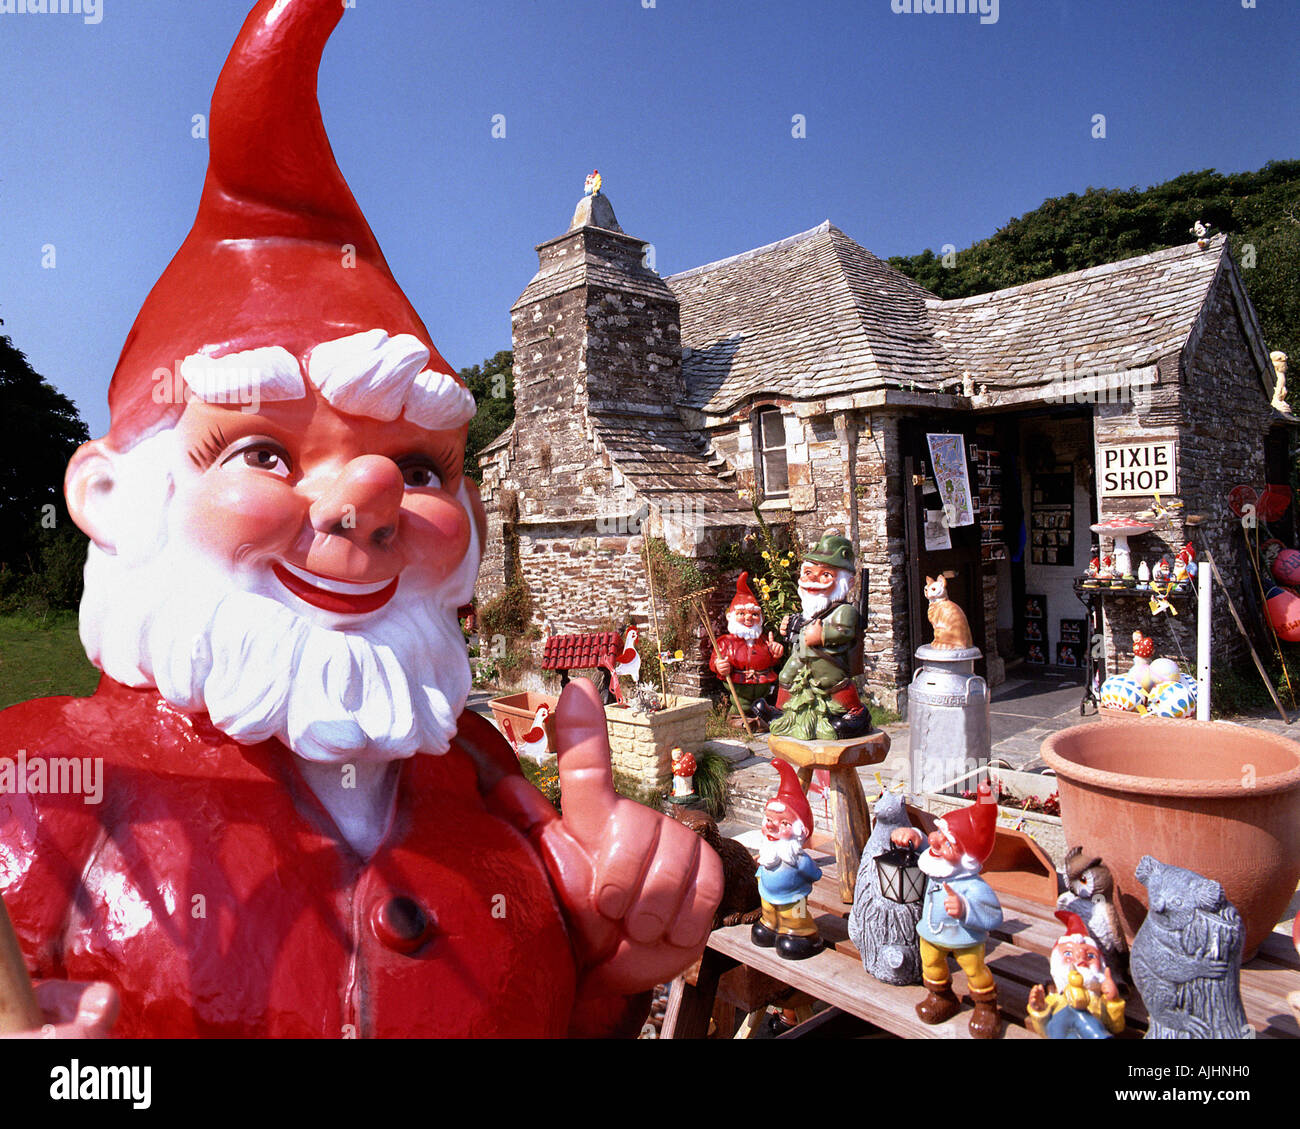 GB - CORNWALL: Pixie Shop in Tintagel Stockbild